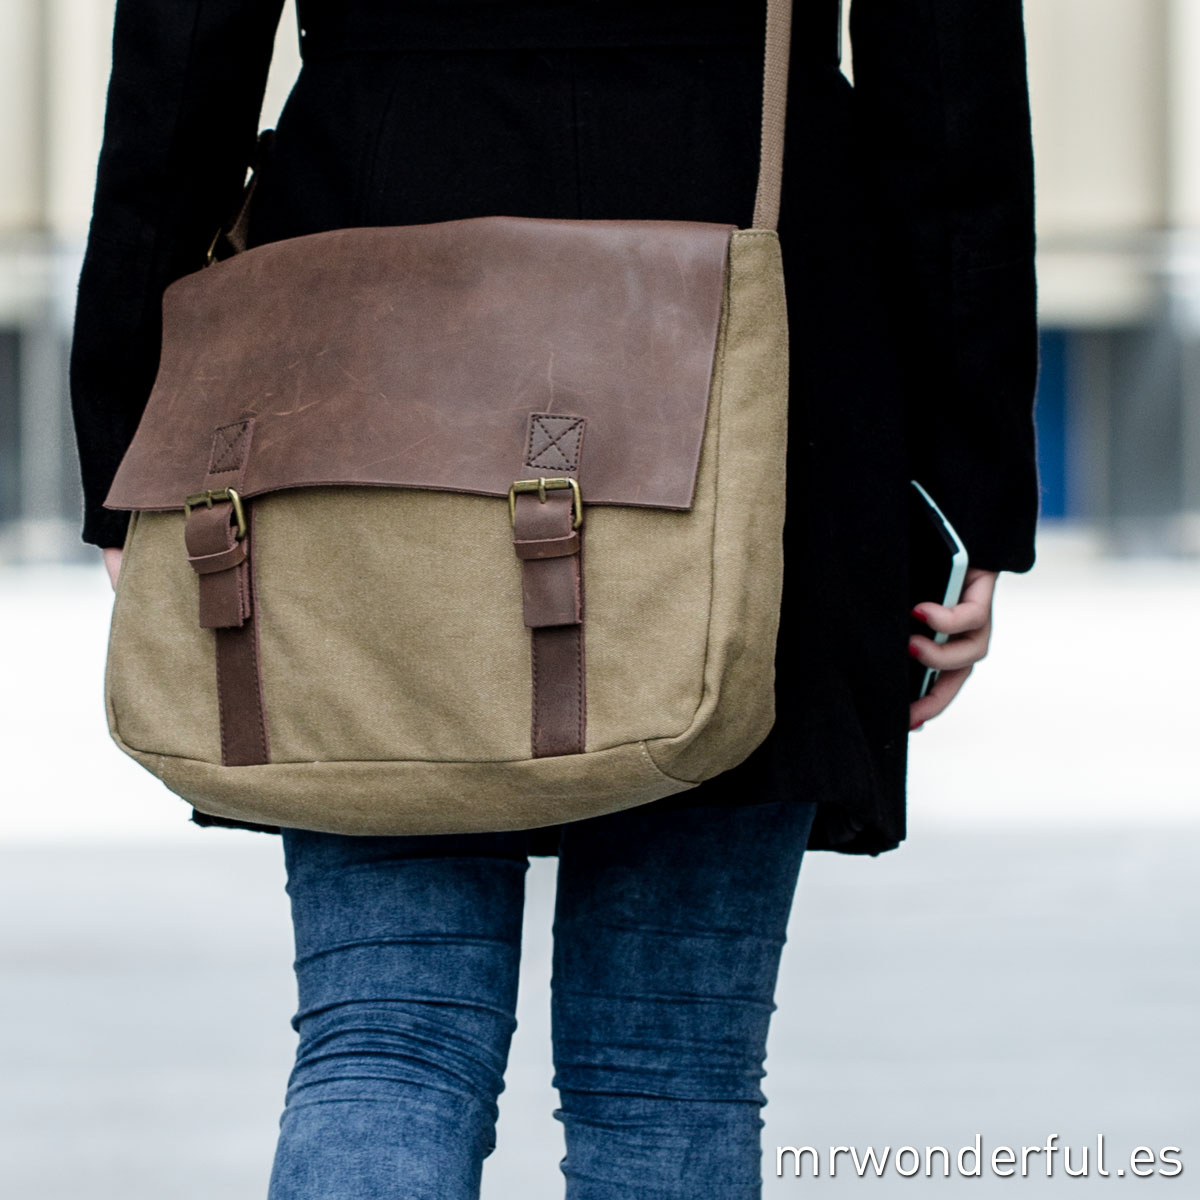 mrwonderful_bags_588-184-Kaki-55-2